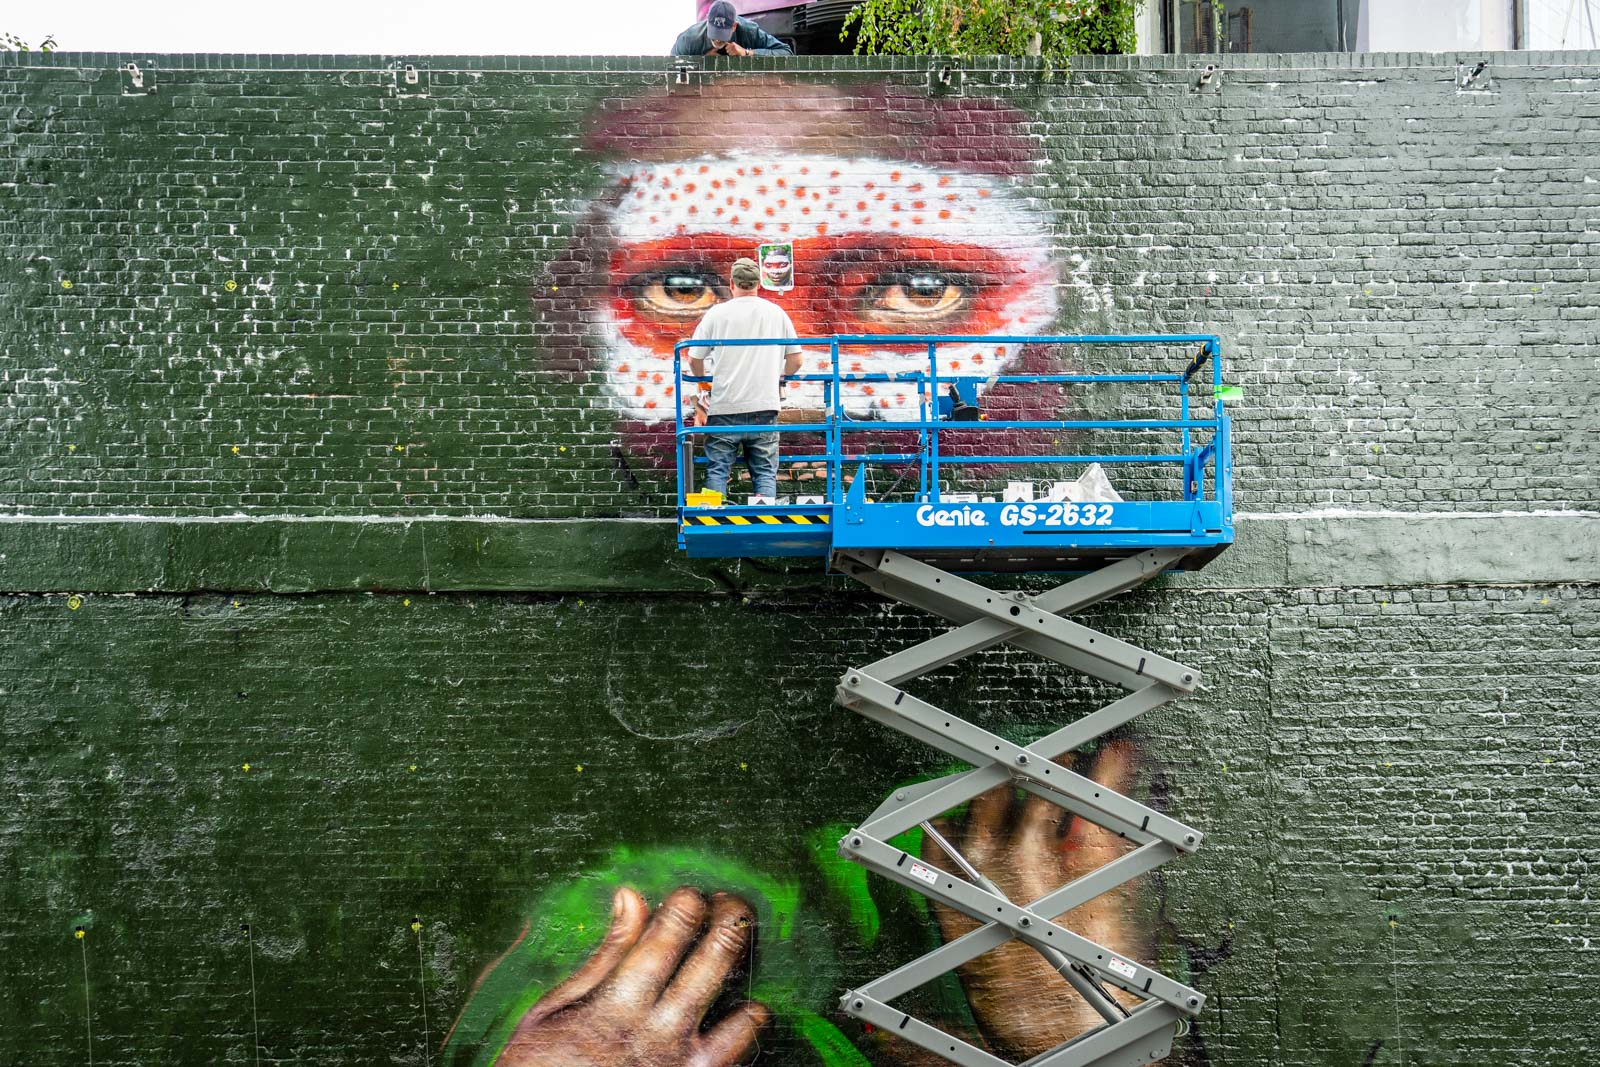 Whitechapel street art